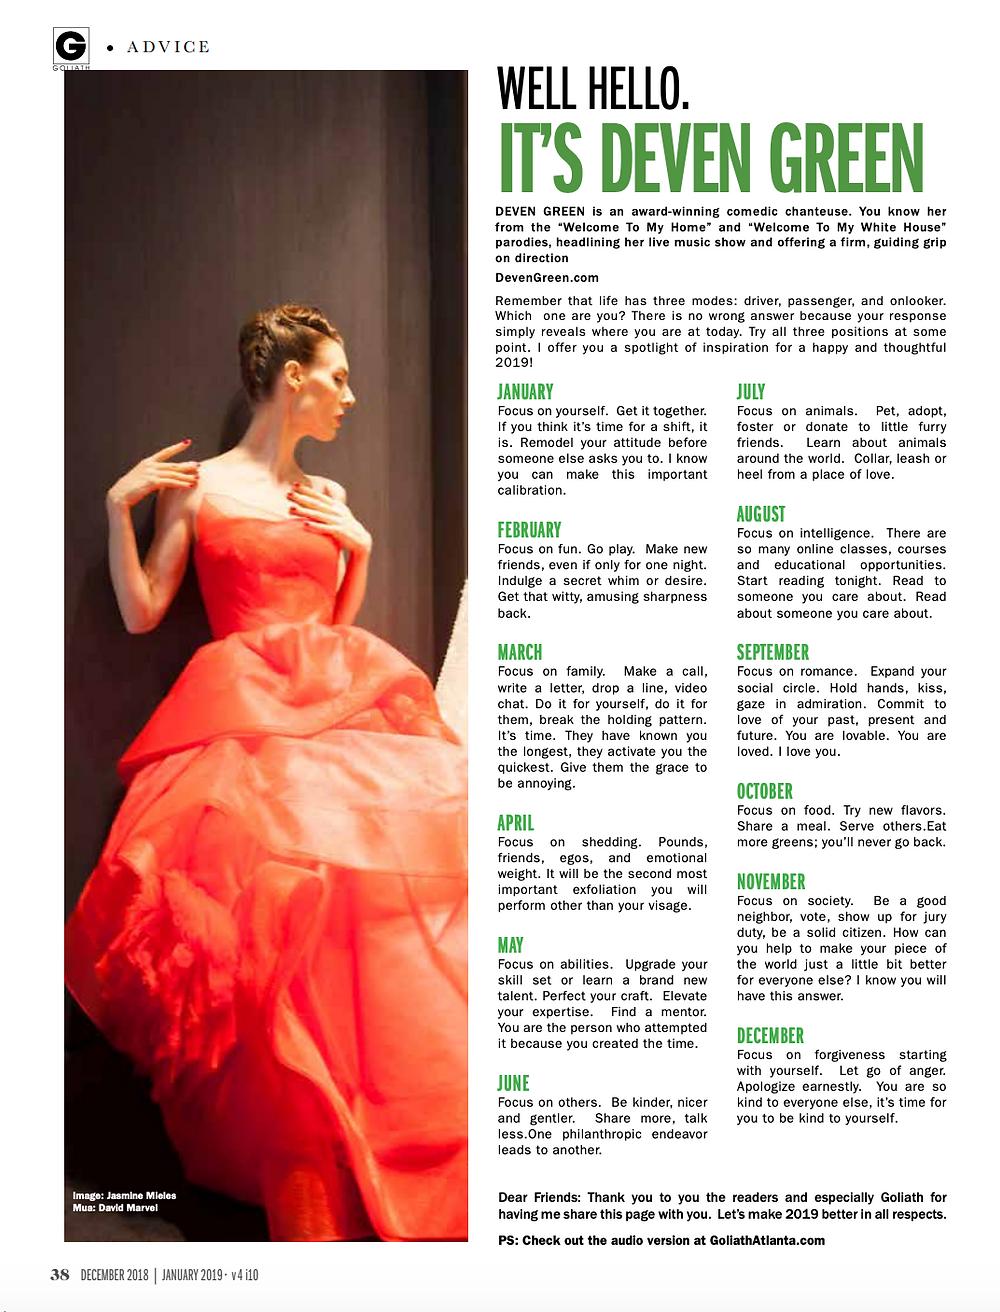 Deven Green goliath advice column